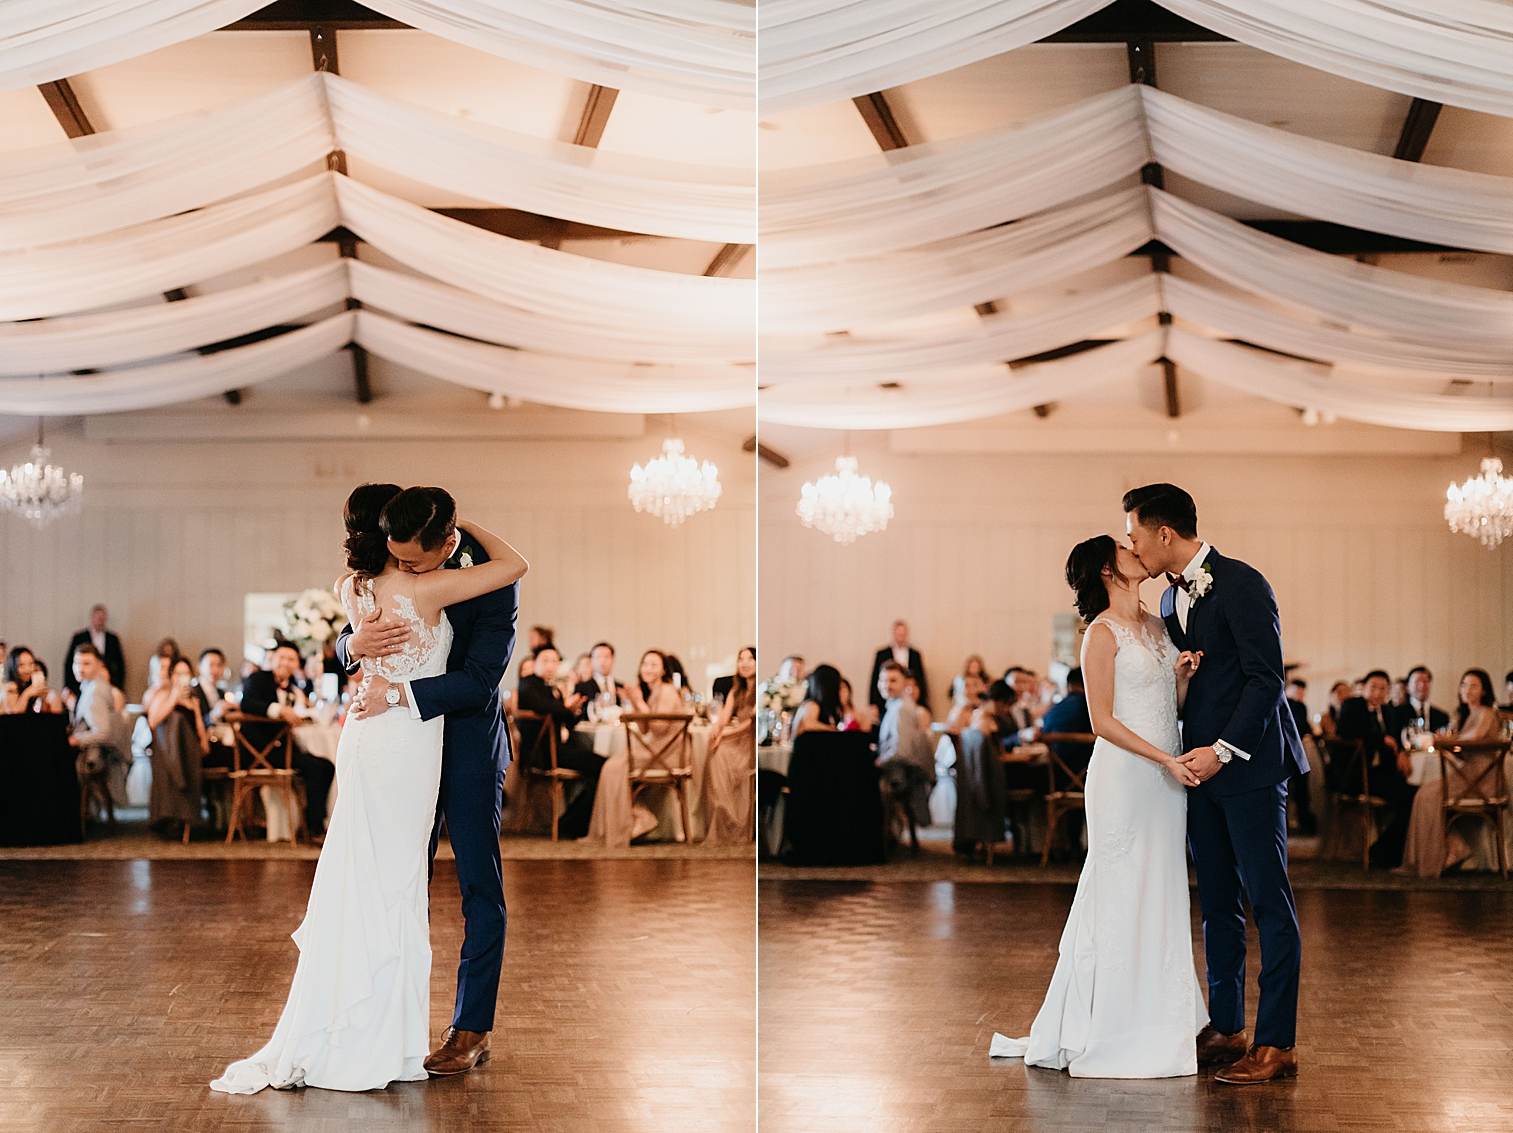 Secret-Garden-Rancho-Santa-Fe-Wedding-113.jpg